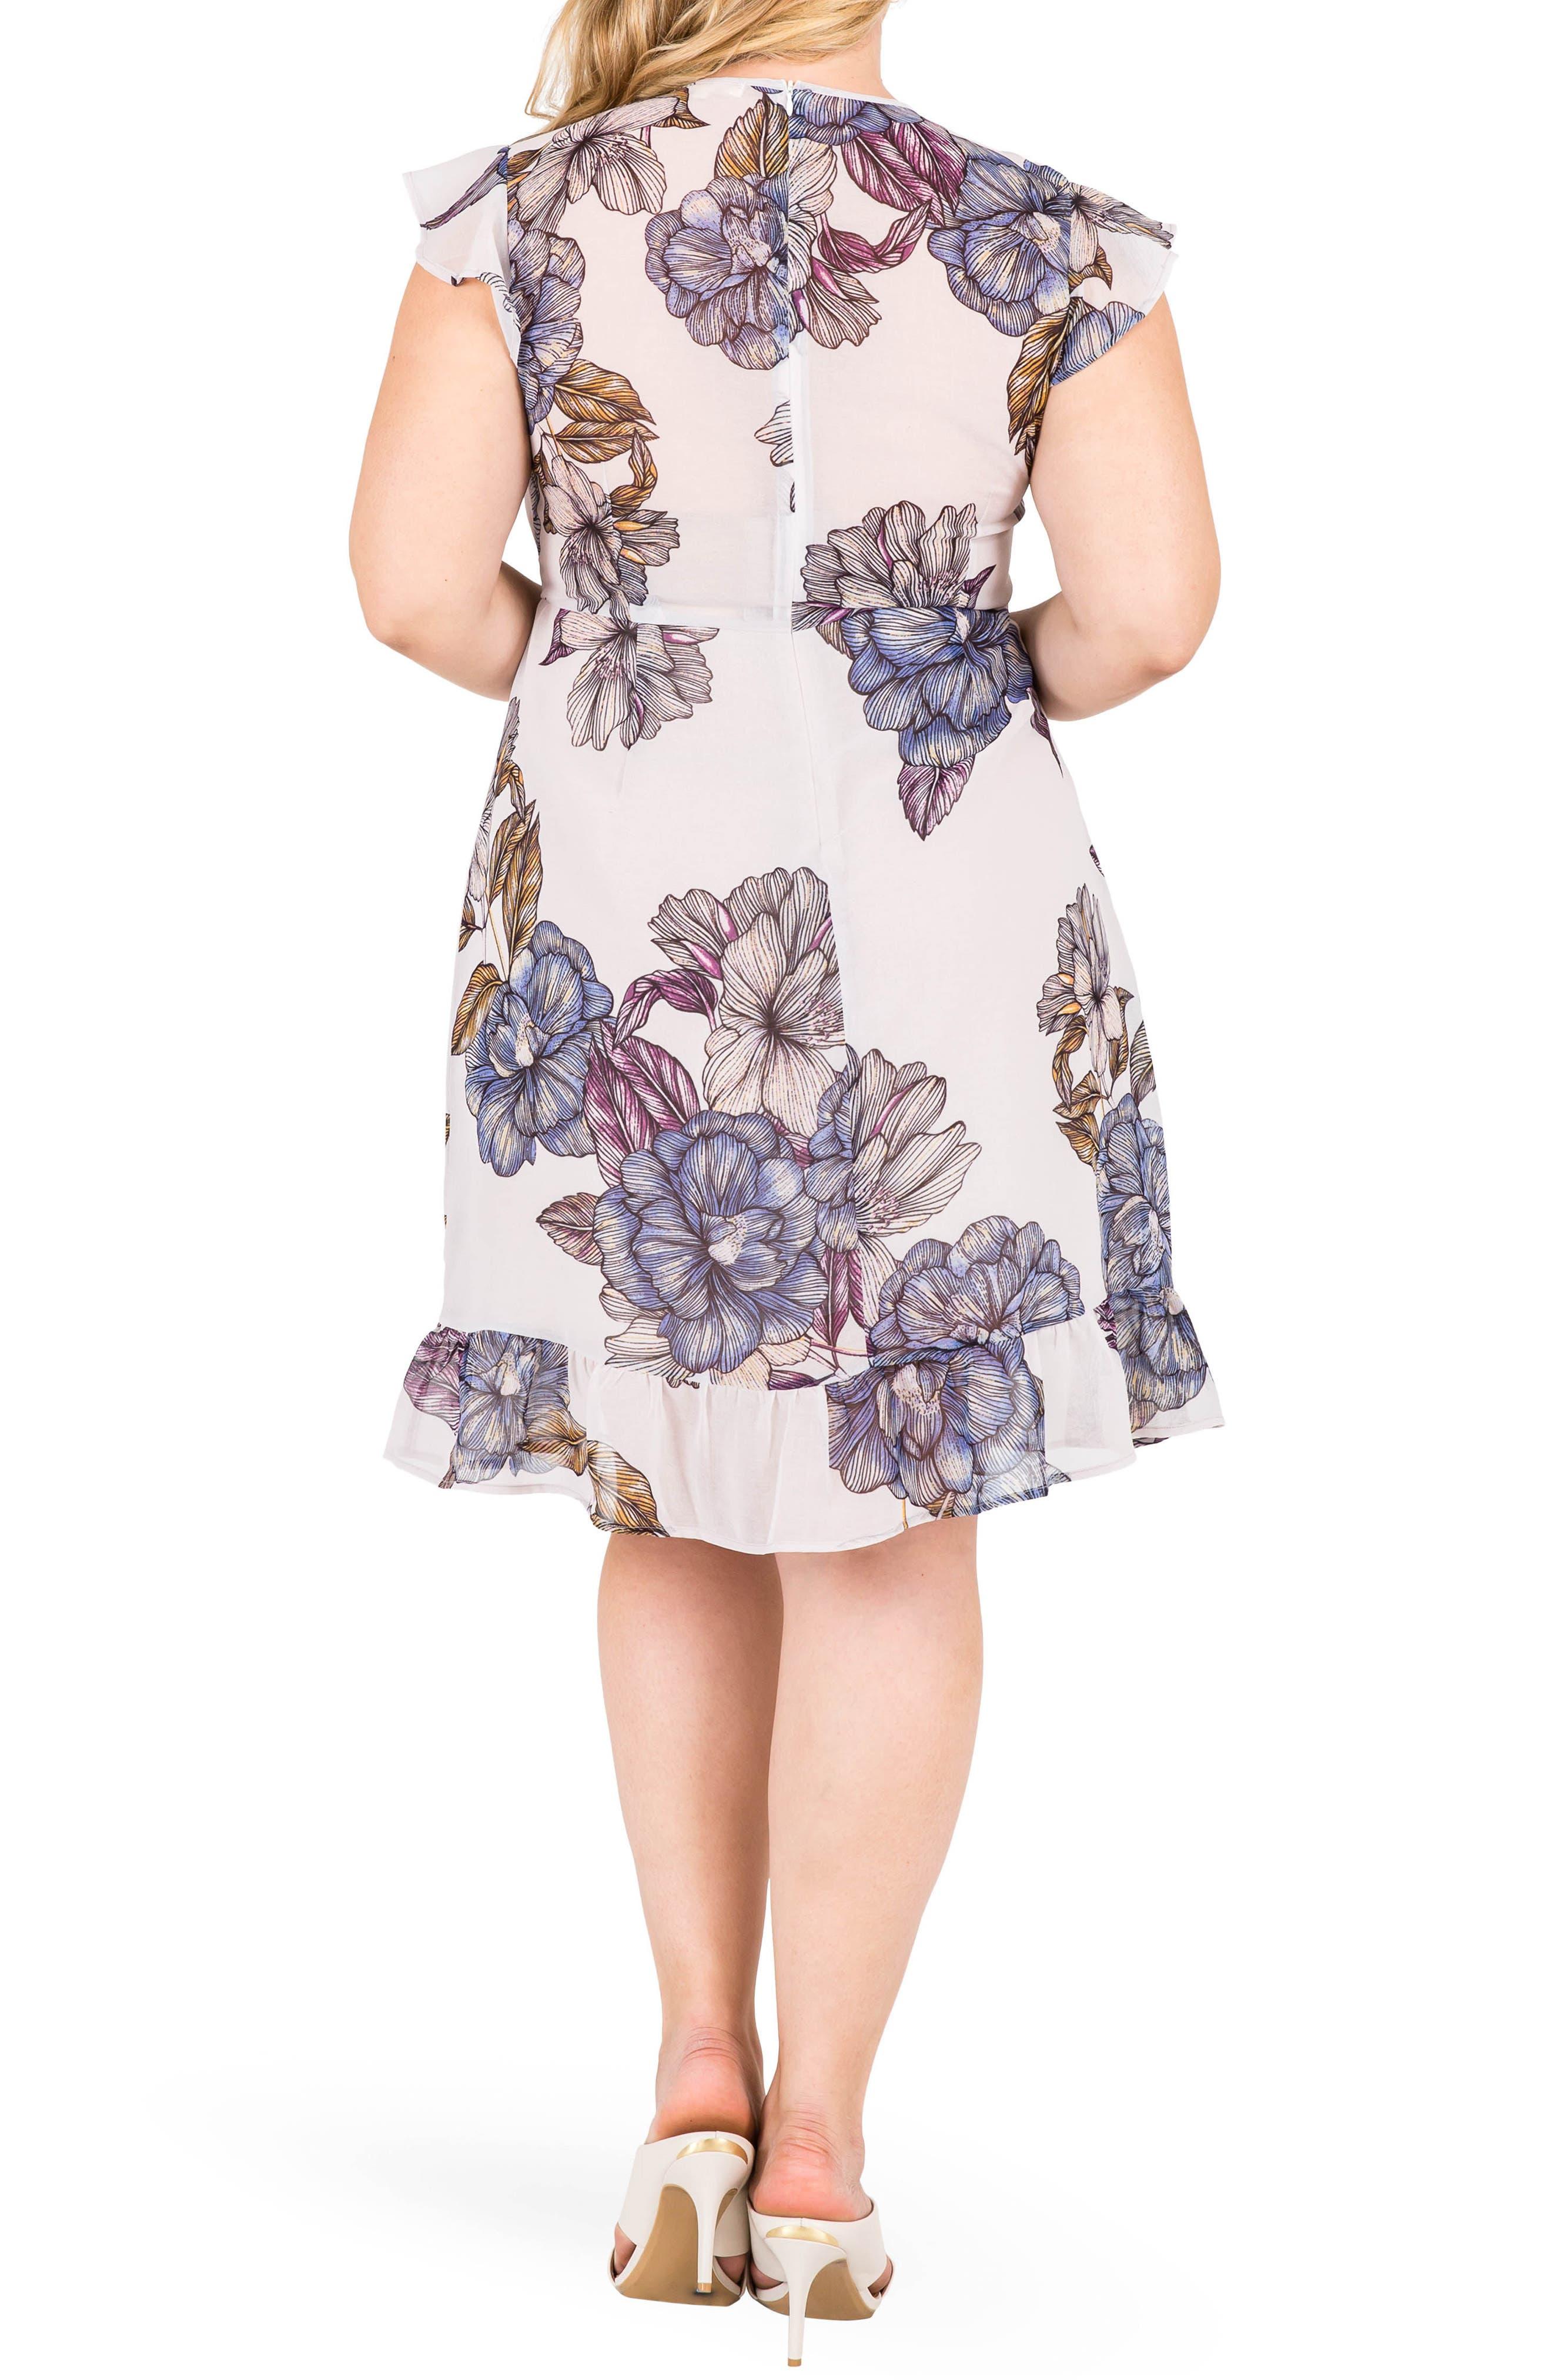 Dion Floral A-Line Dress,                             Alternate thumbnail 2, color,                             LIGHT GRAY FLORAL PRINT